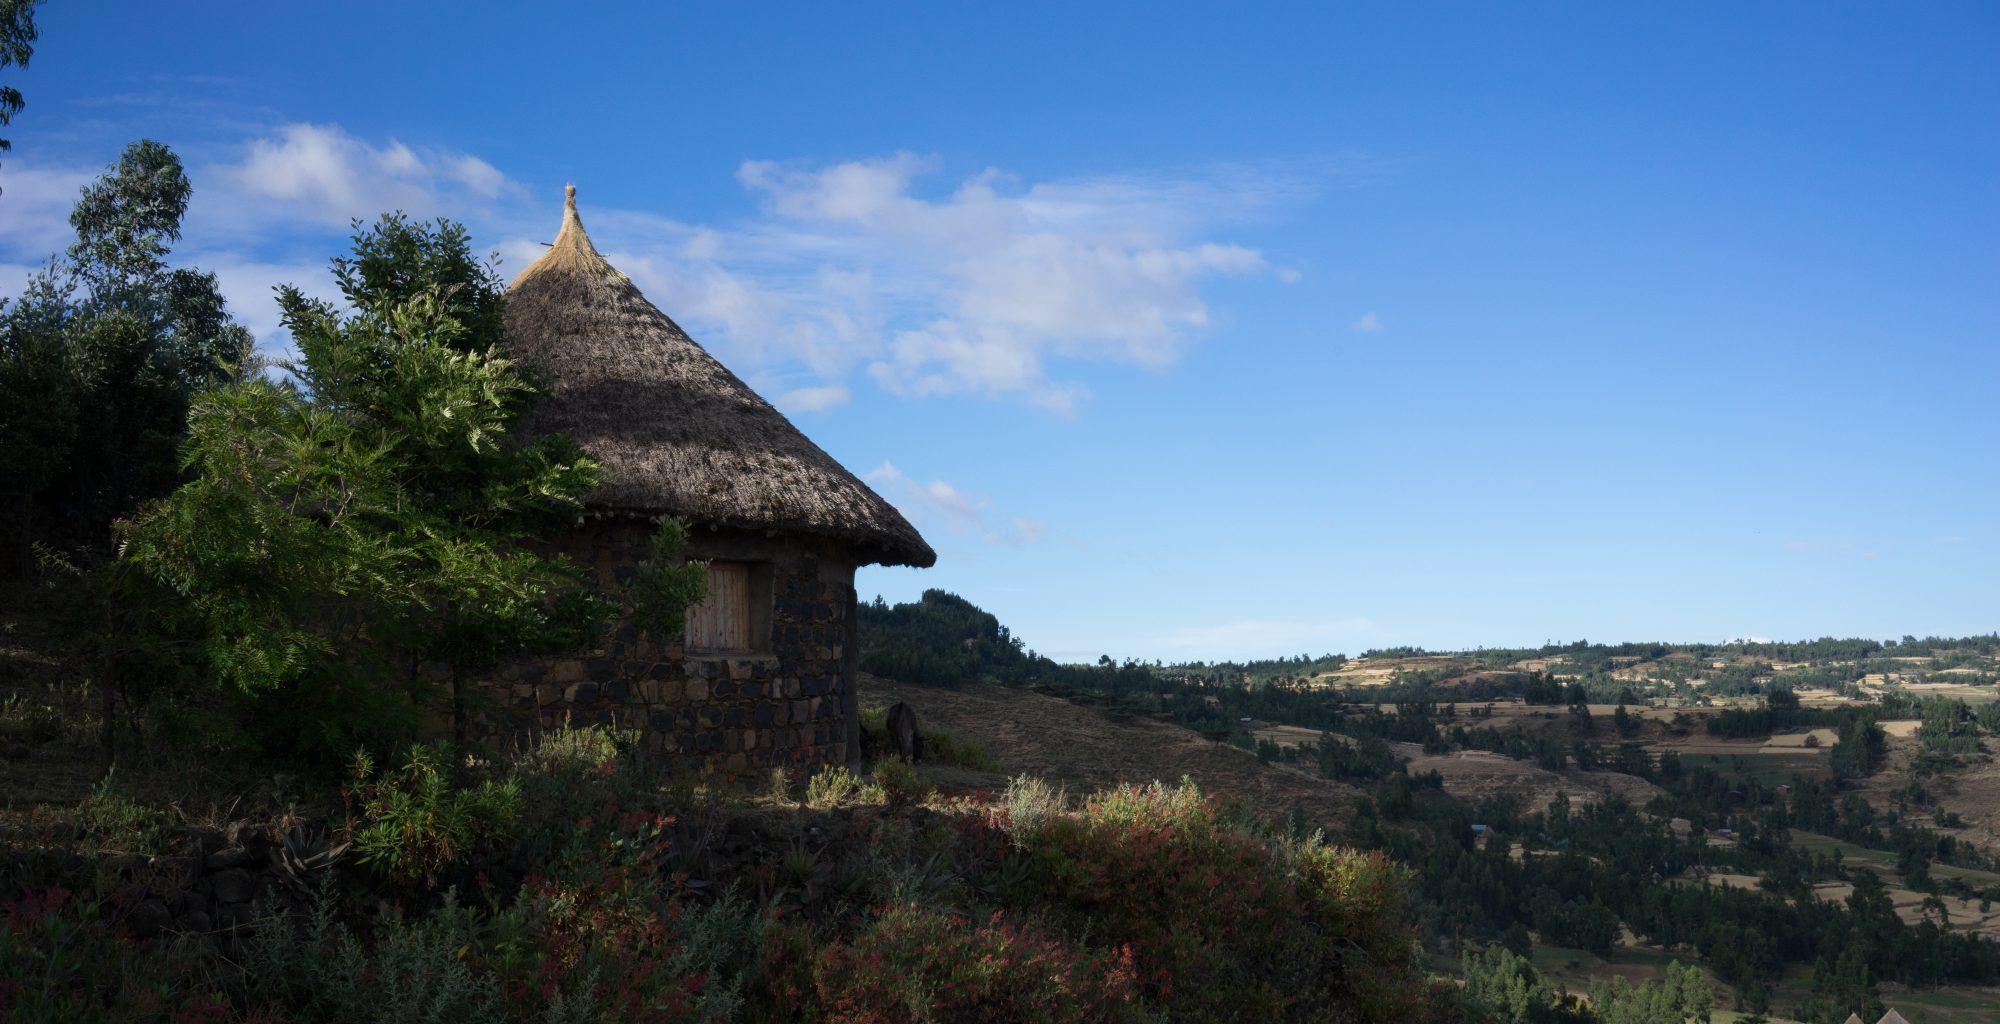 Ethiopia-Tukul-Village-Exterior